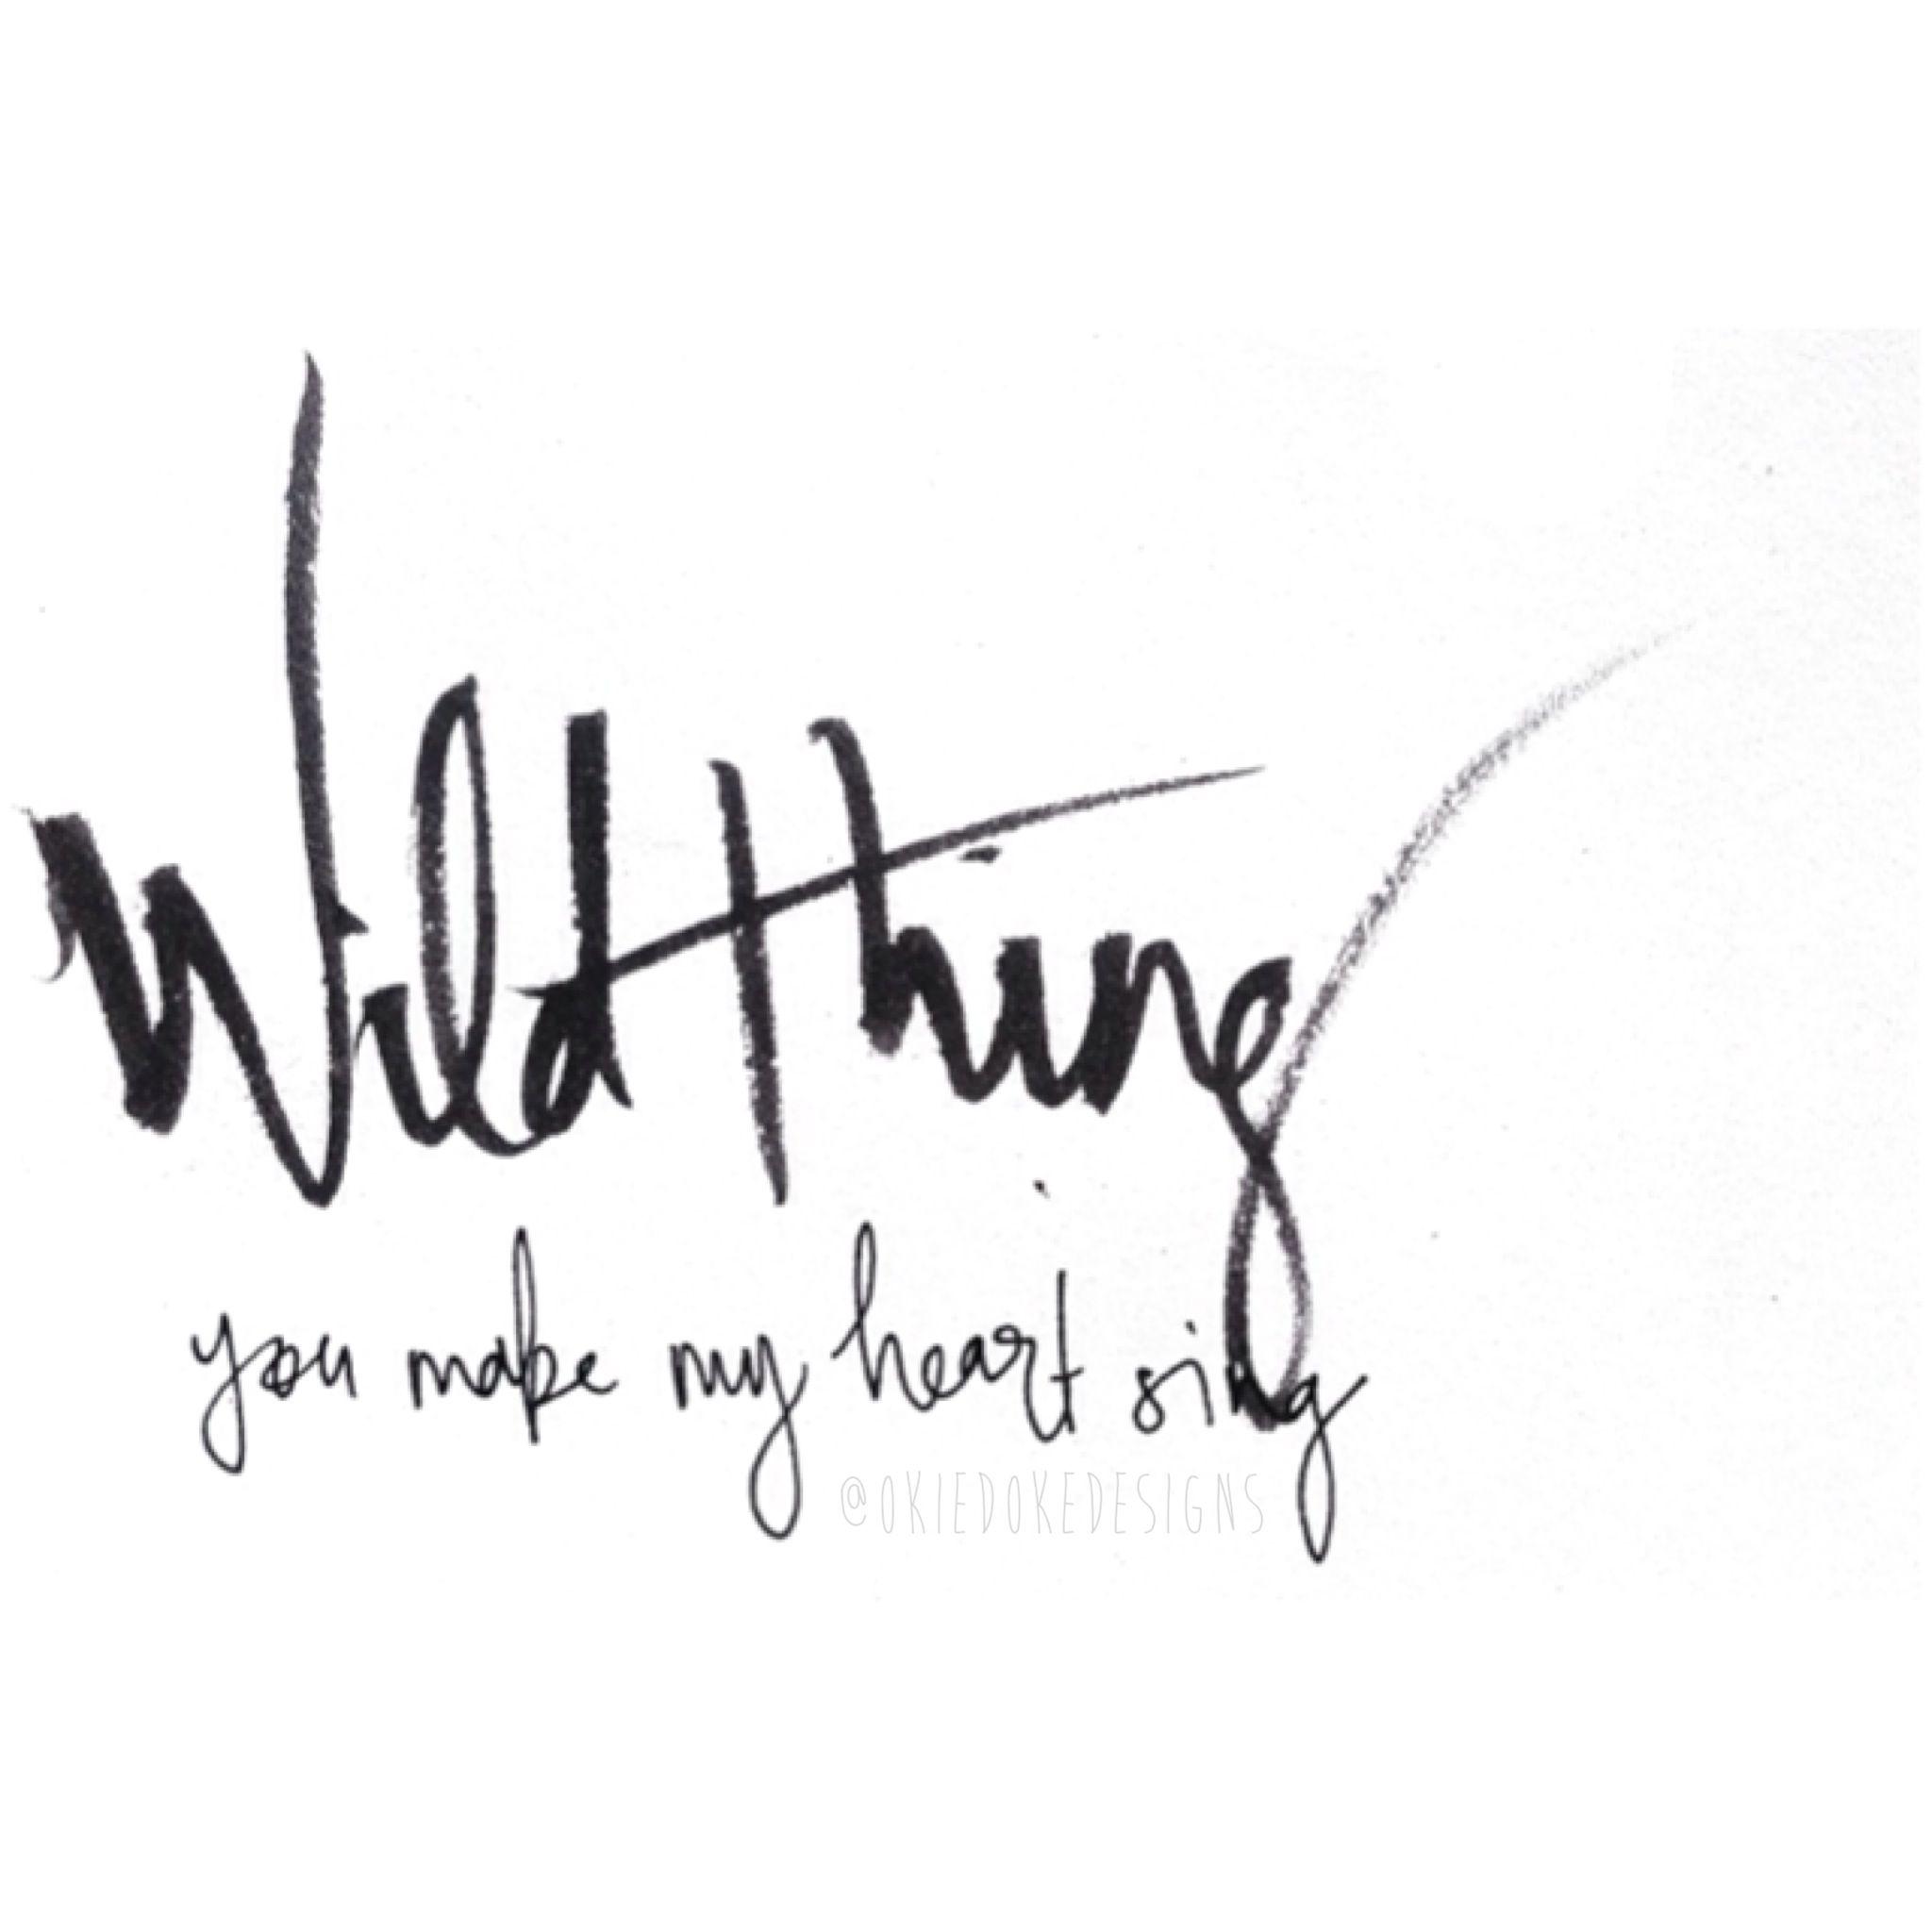 Wild Thing You Make My Heart Sing Okiedokedesigns